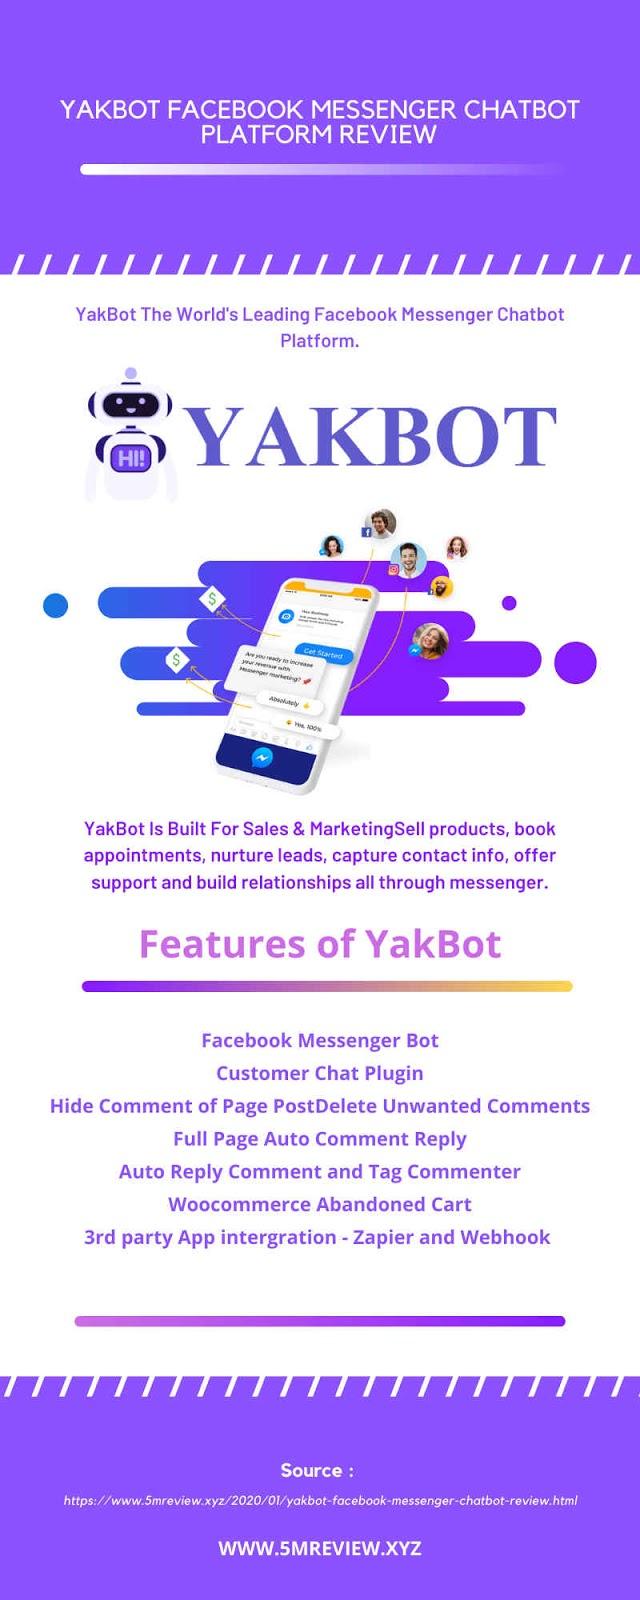 YakBot Facebook Messenger Chatbot Platform Review